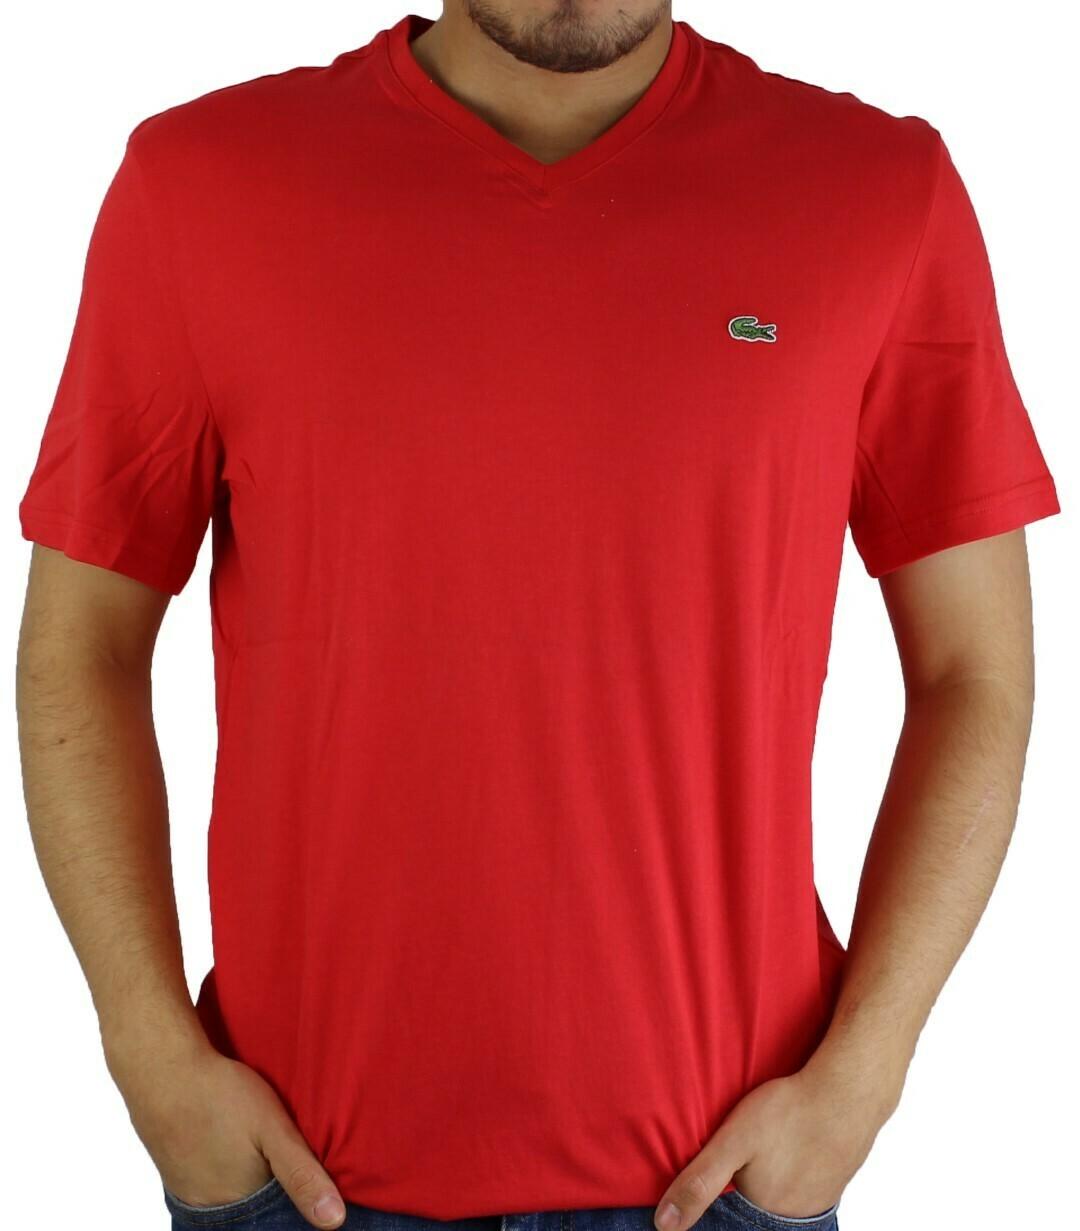 Lacoste Men's T-Shirt V Neck Red